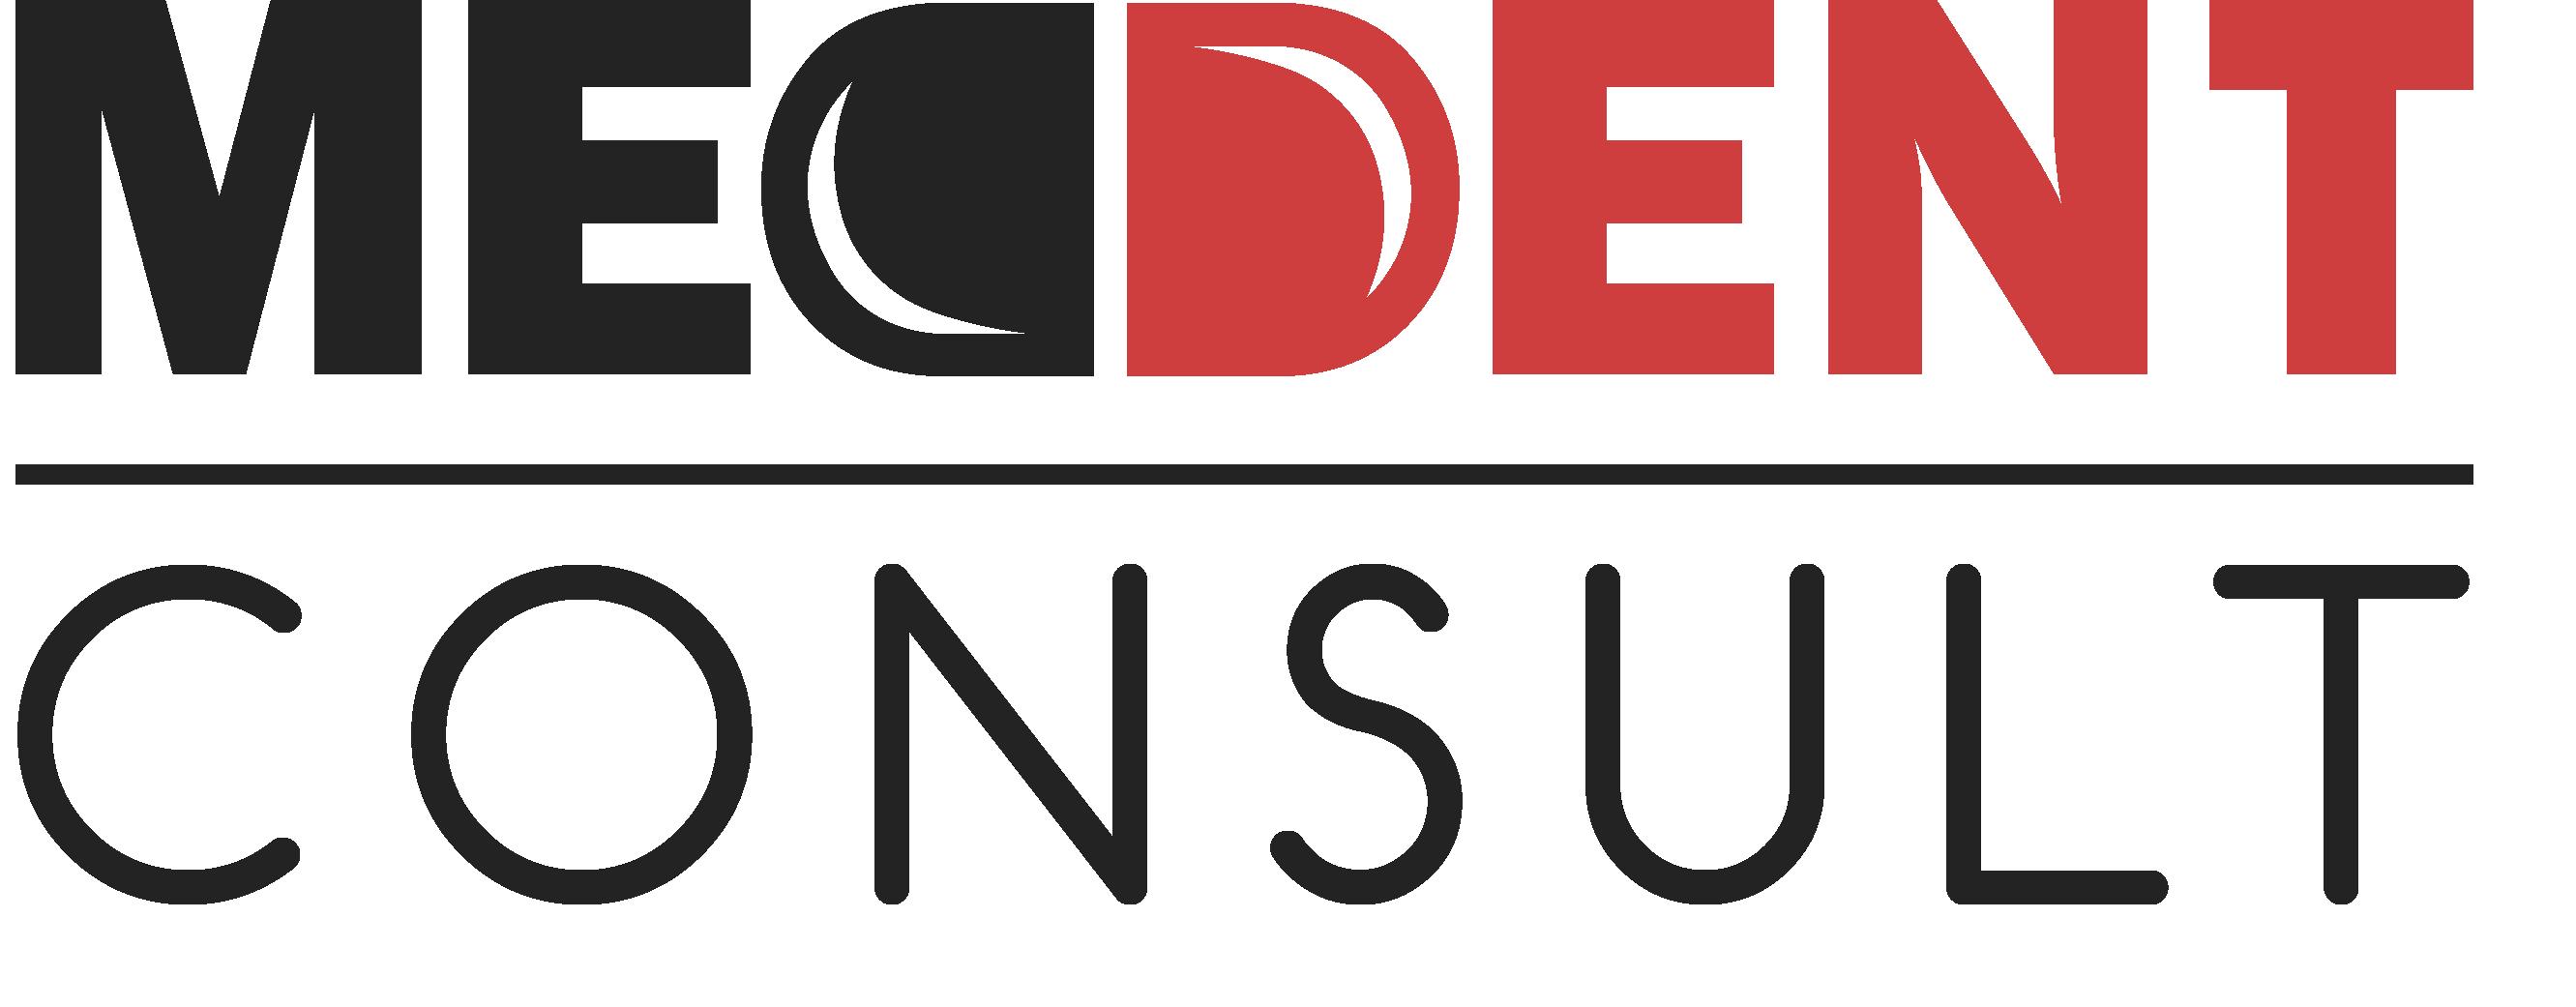 Medeconsult Shop Logo